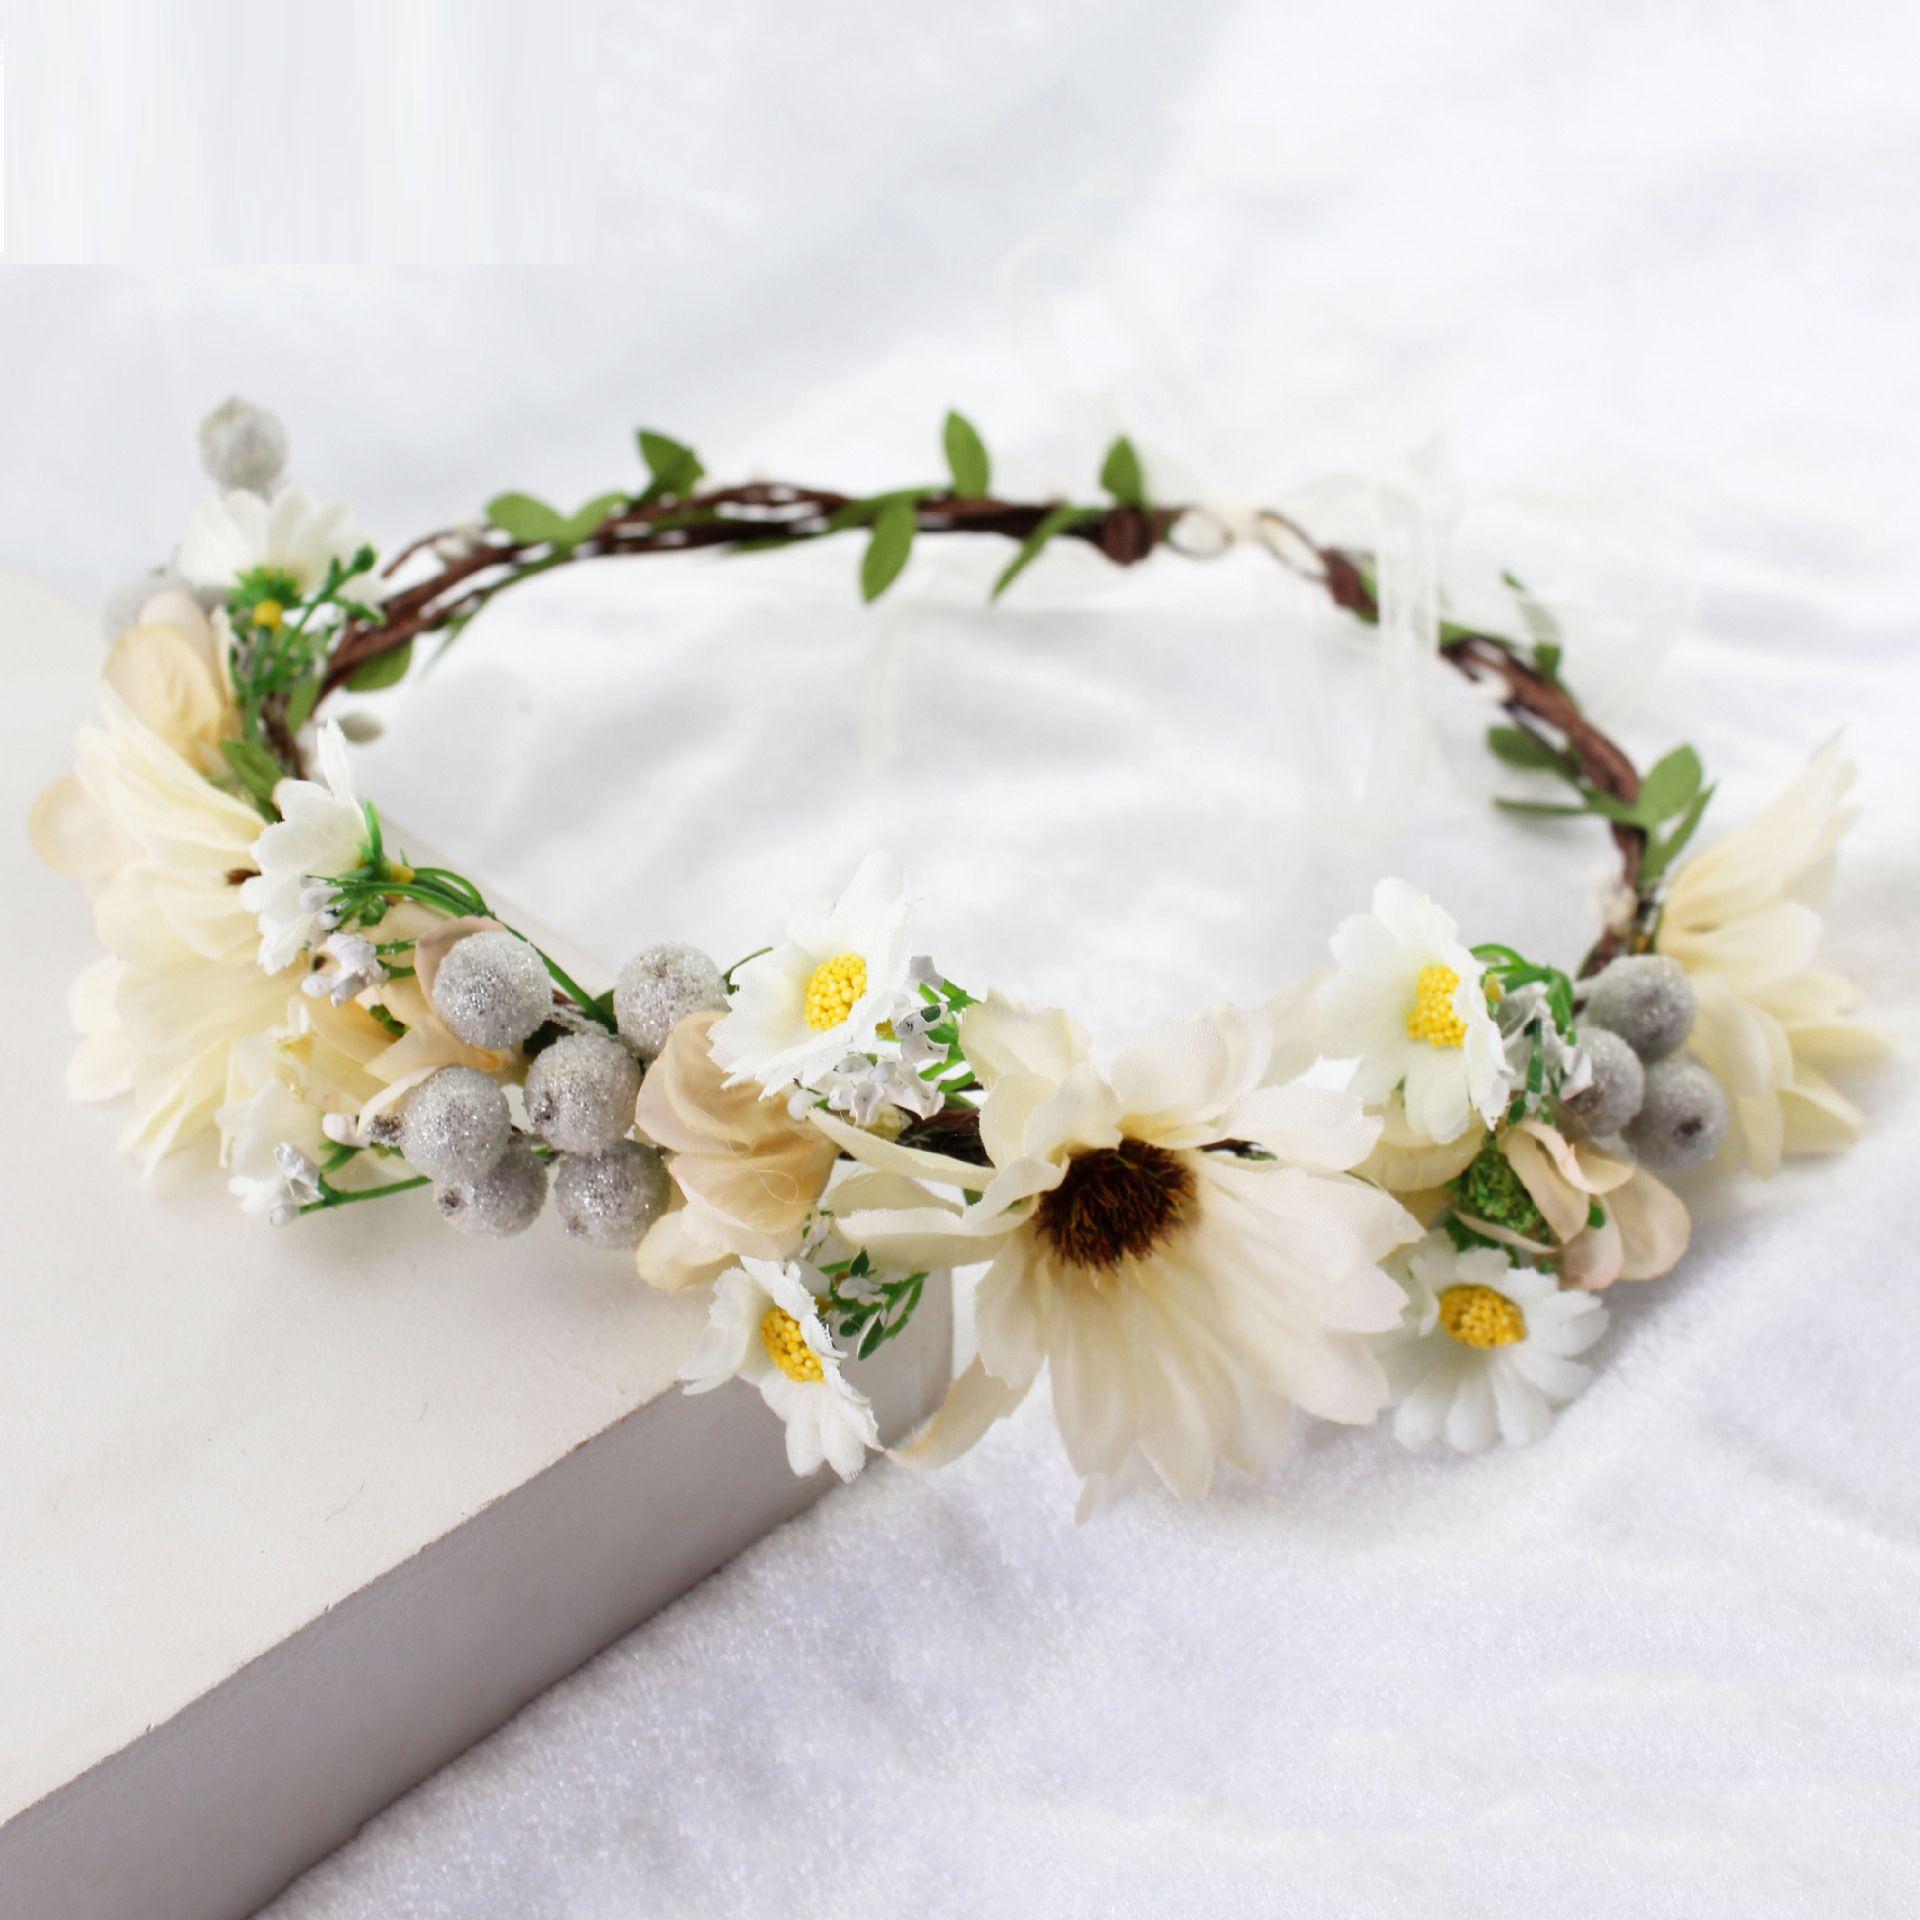 Flower Wreath Headband Floral Crown Garland Halo For Wedding